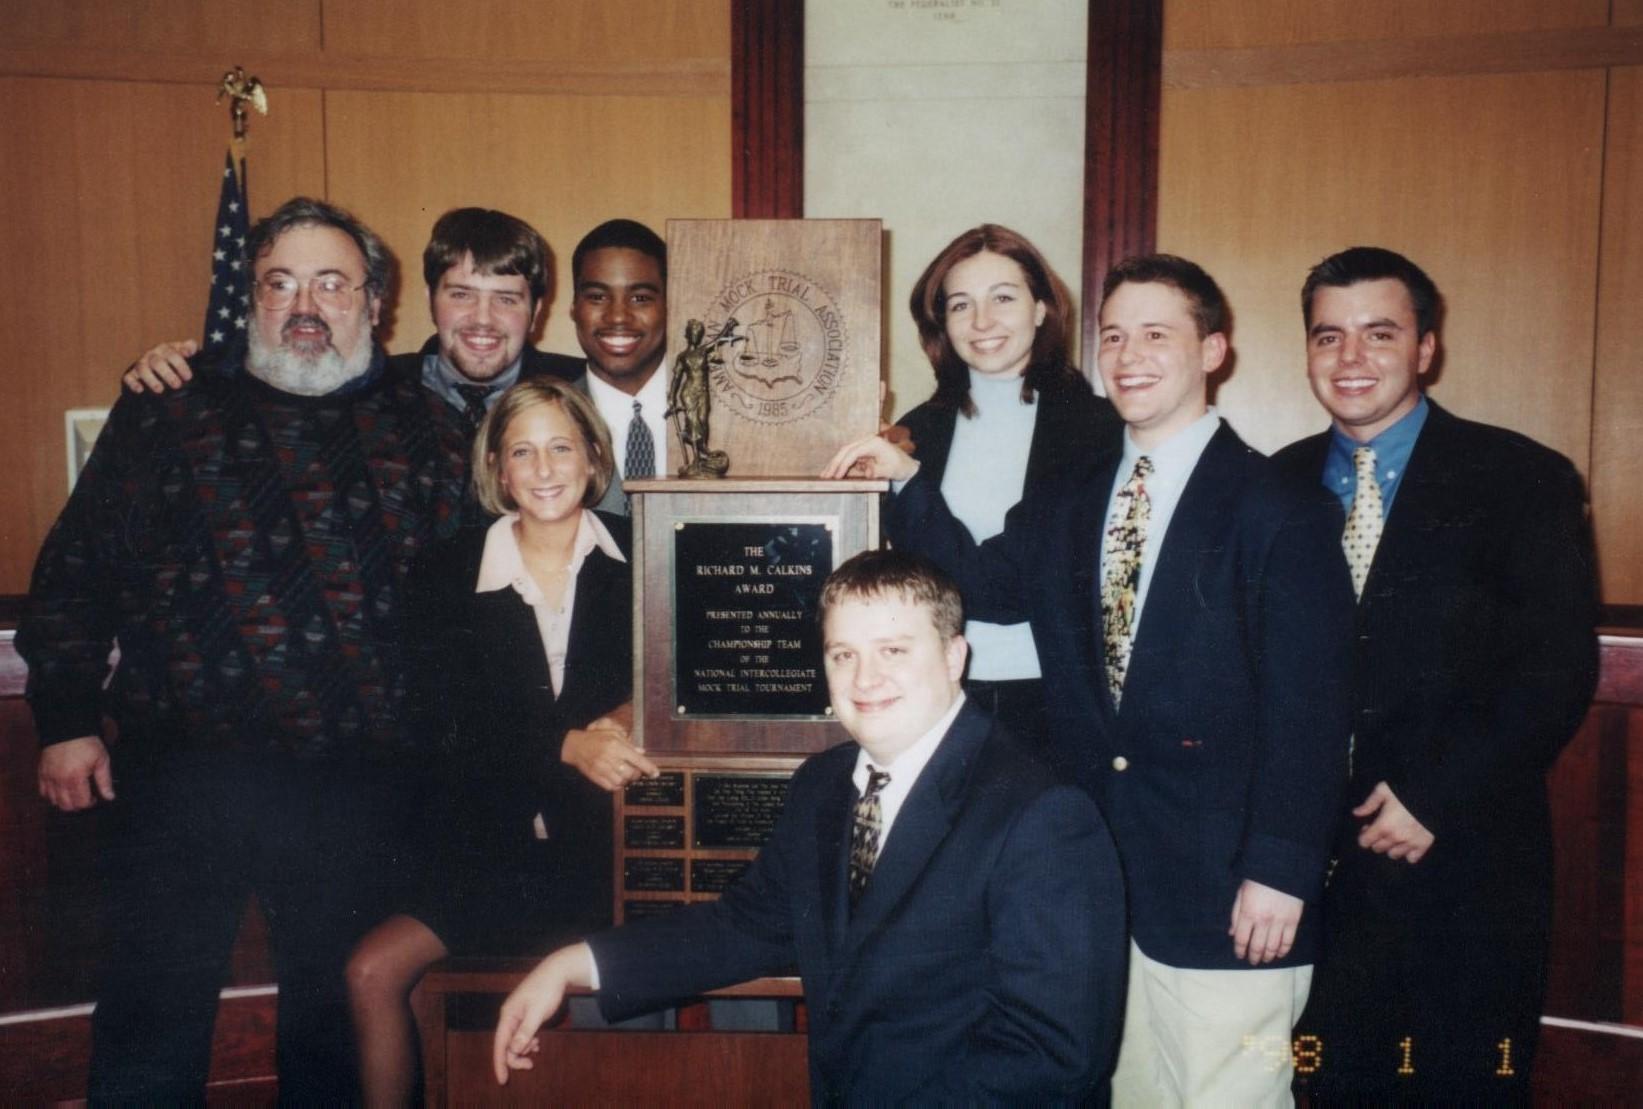 2001 National Champions (Left to right): Dan Herron (Coach), Mark Sedor, Alyson Miller, Dexter Benoit, Mark Thompson, Breane McMullen, Ryan Sobel, Chad Burton